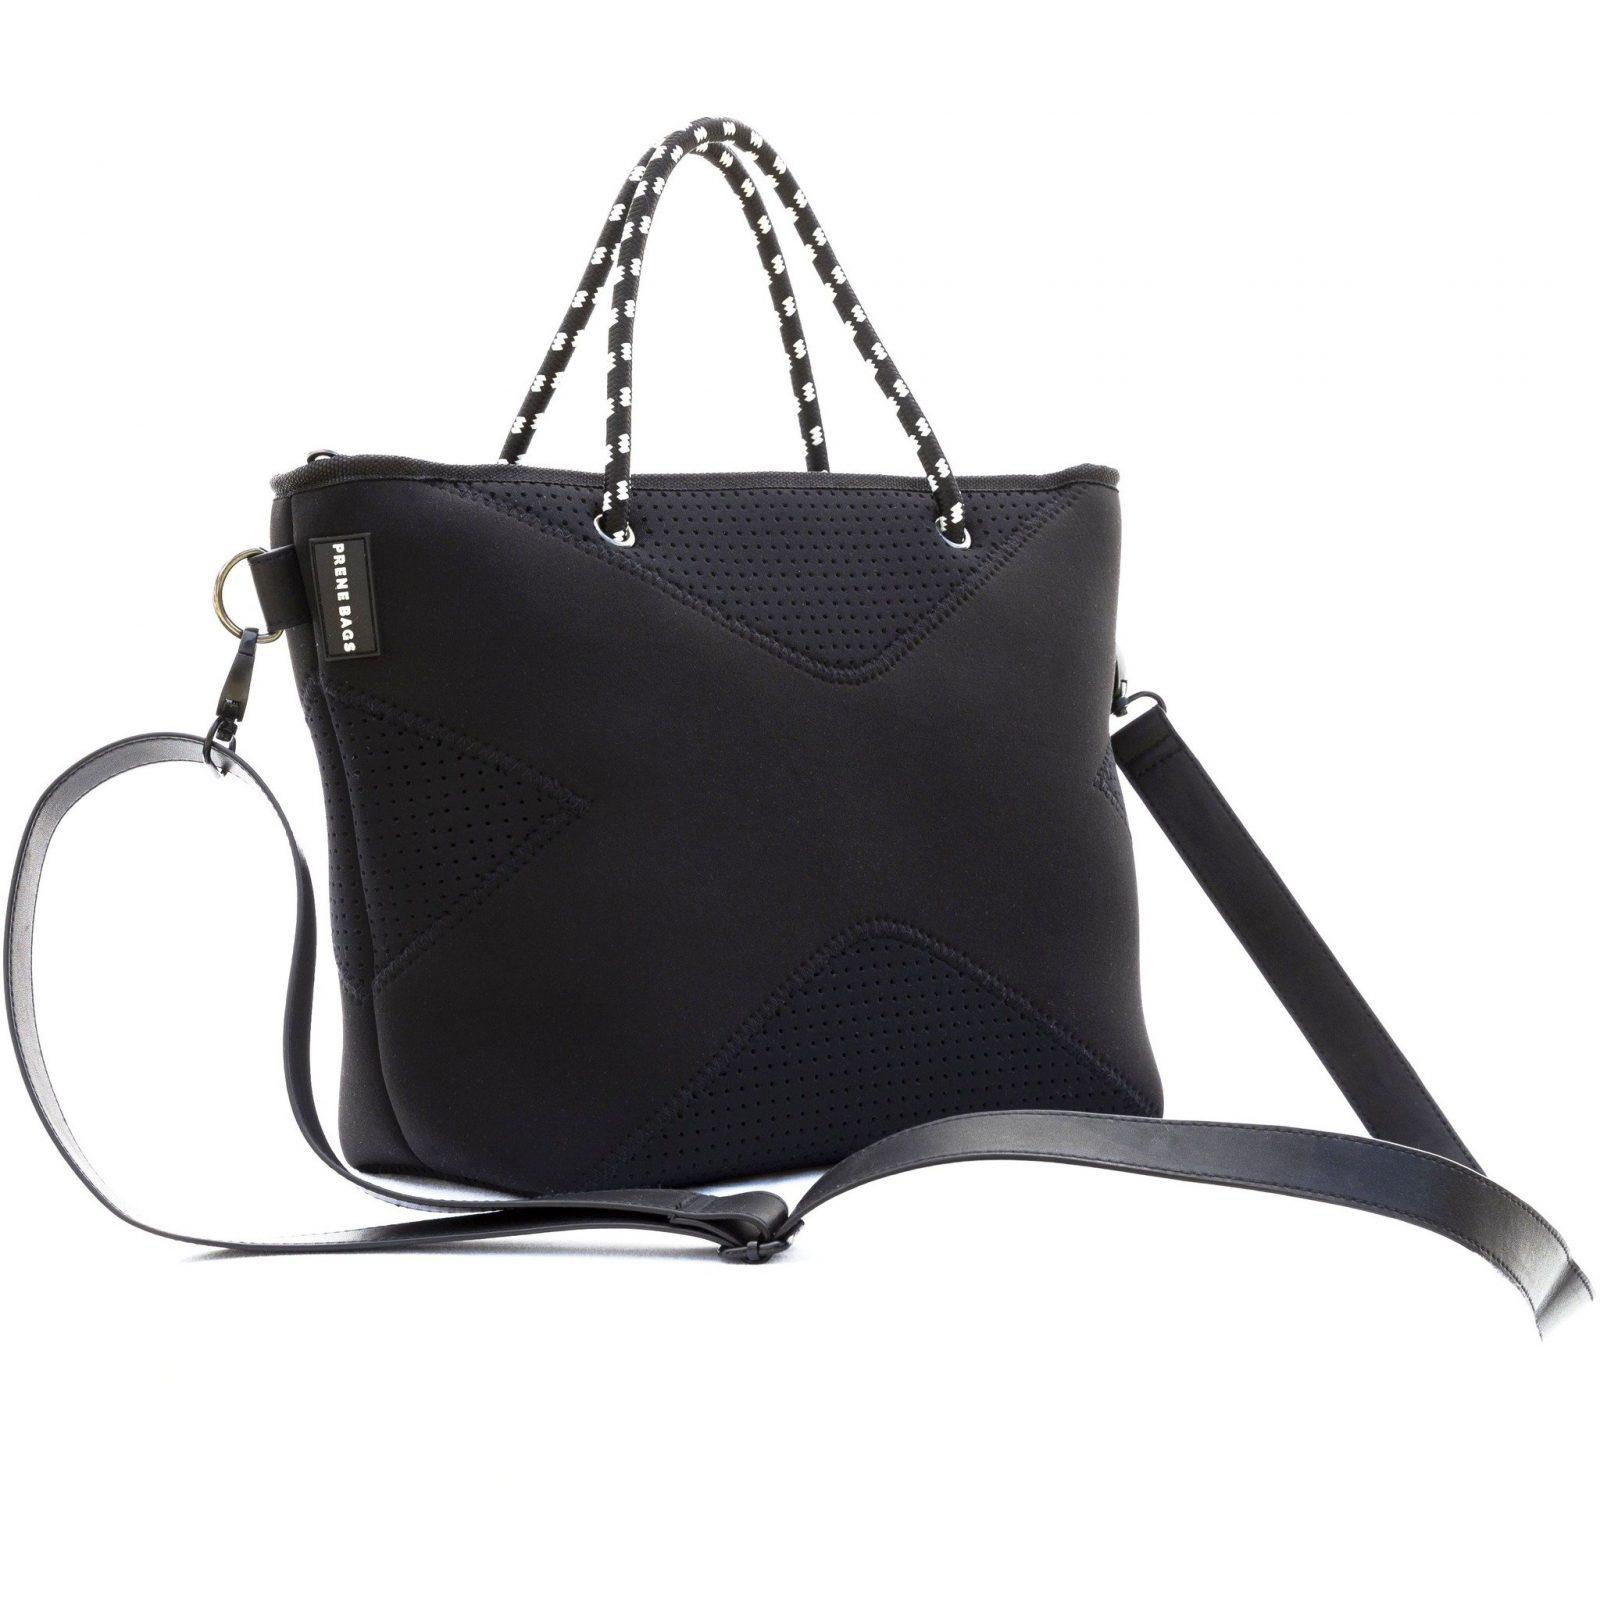 517113a8ca Prene – The XS Bag Black Neoprene Crossbody – Tote Bag – Rubys Gifts